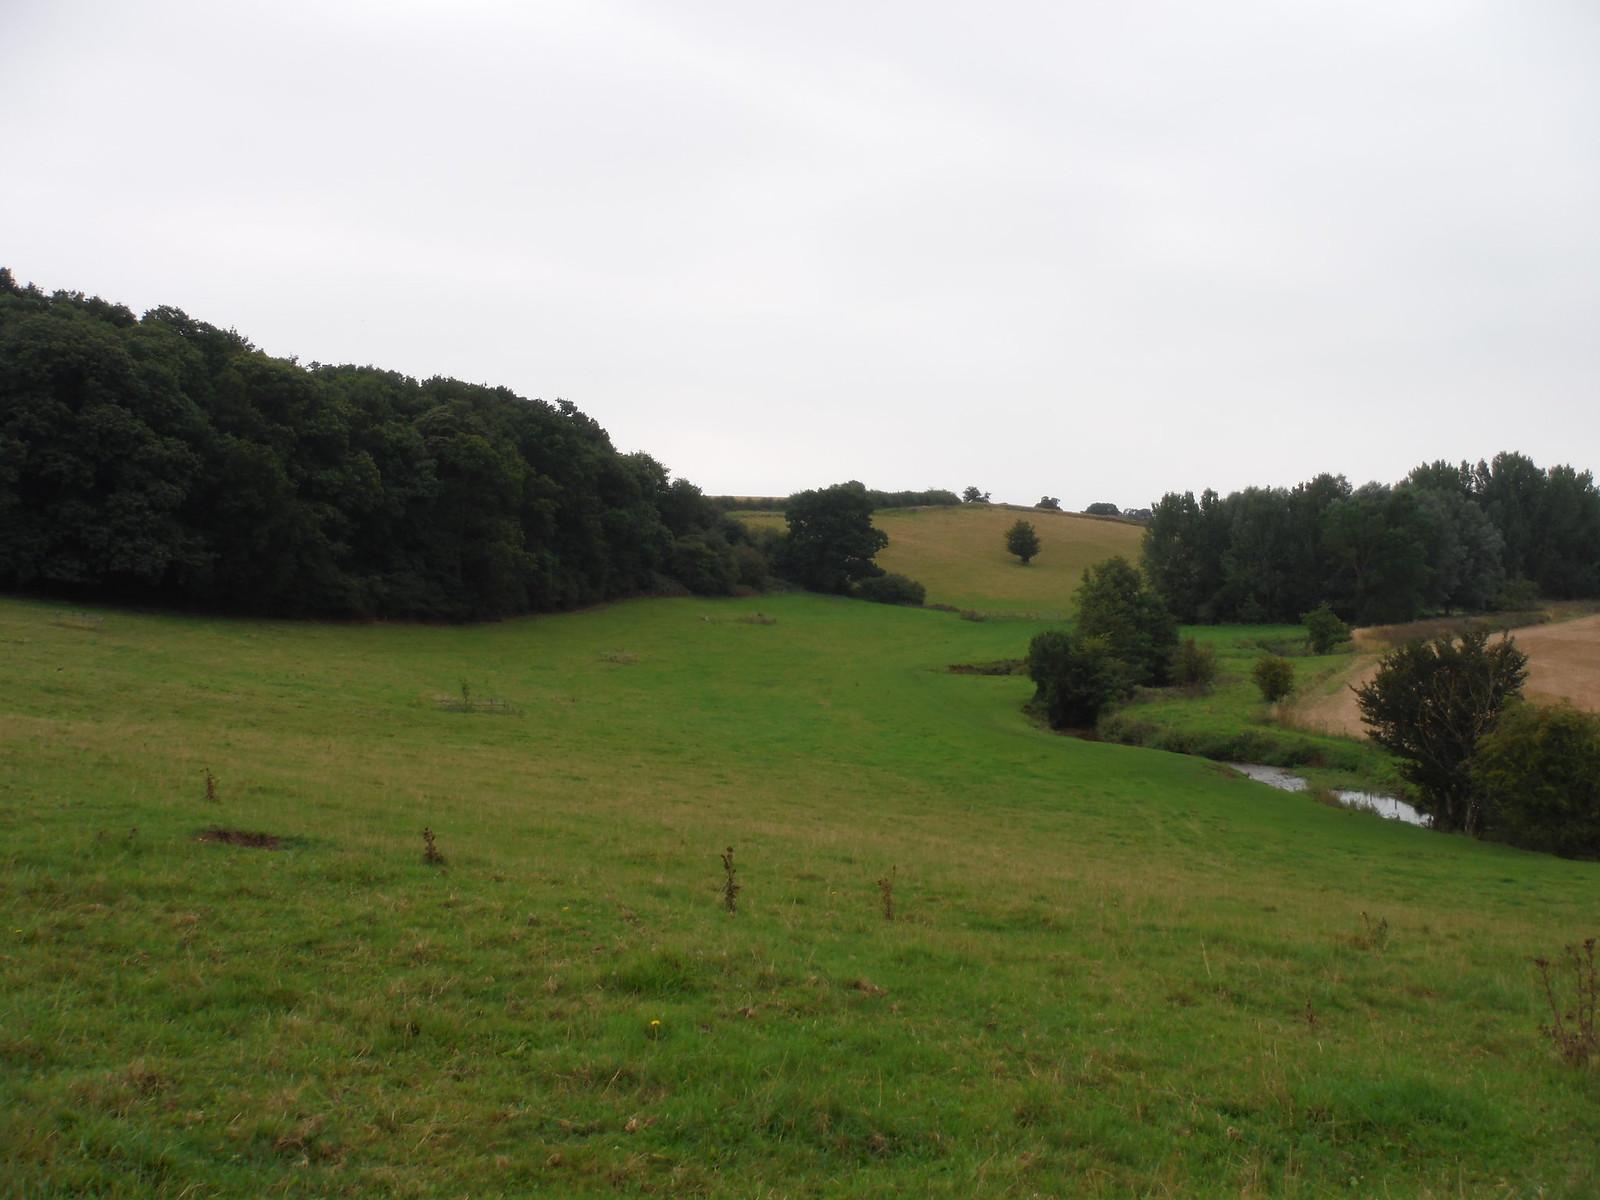 Ash Valley Backview SWC Walk 164 Roydon to Sawbridgeworth via Henry Moore Foundation